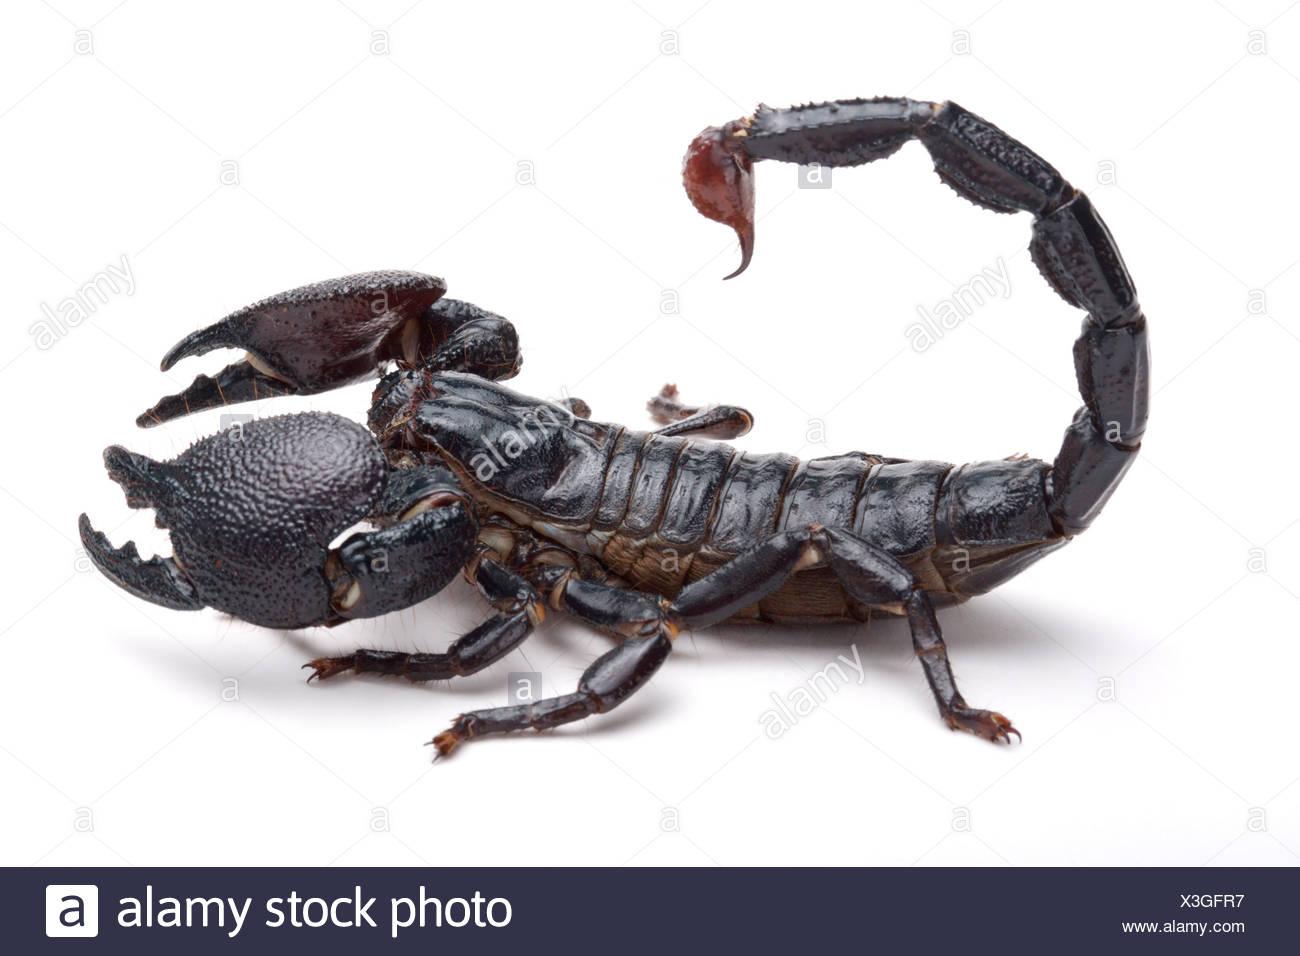 scorpion Stockfotos & \'scorpion Bilder - Seite 10 - Alamy